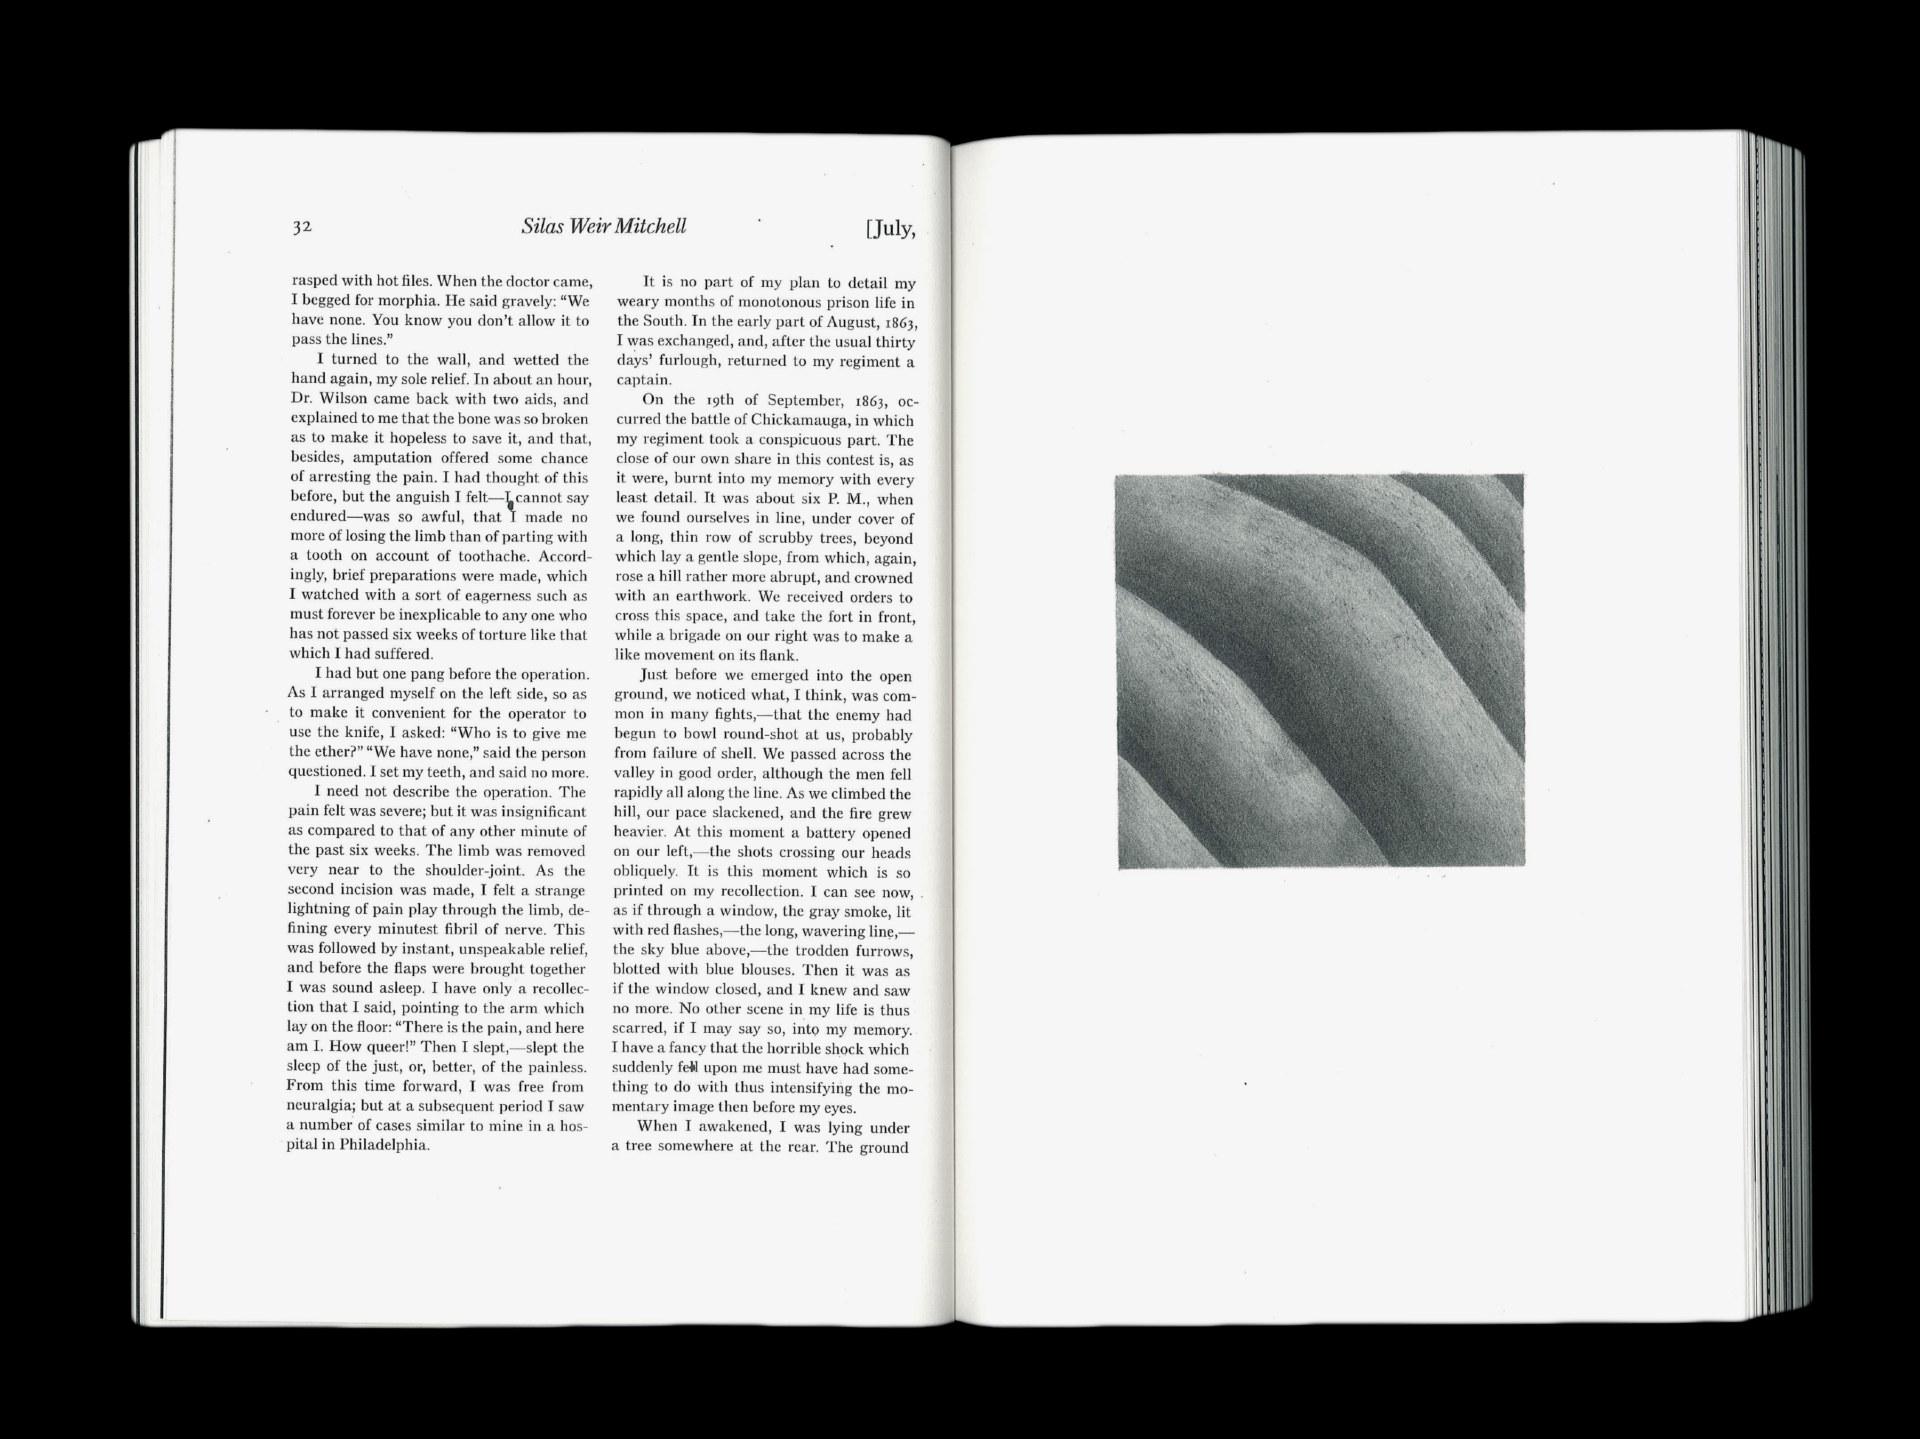 Klasse John Morgan Raum 106, Issue 1